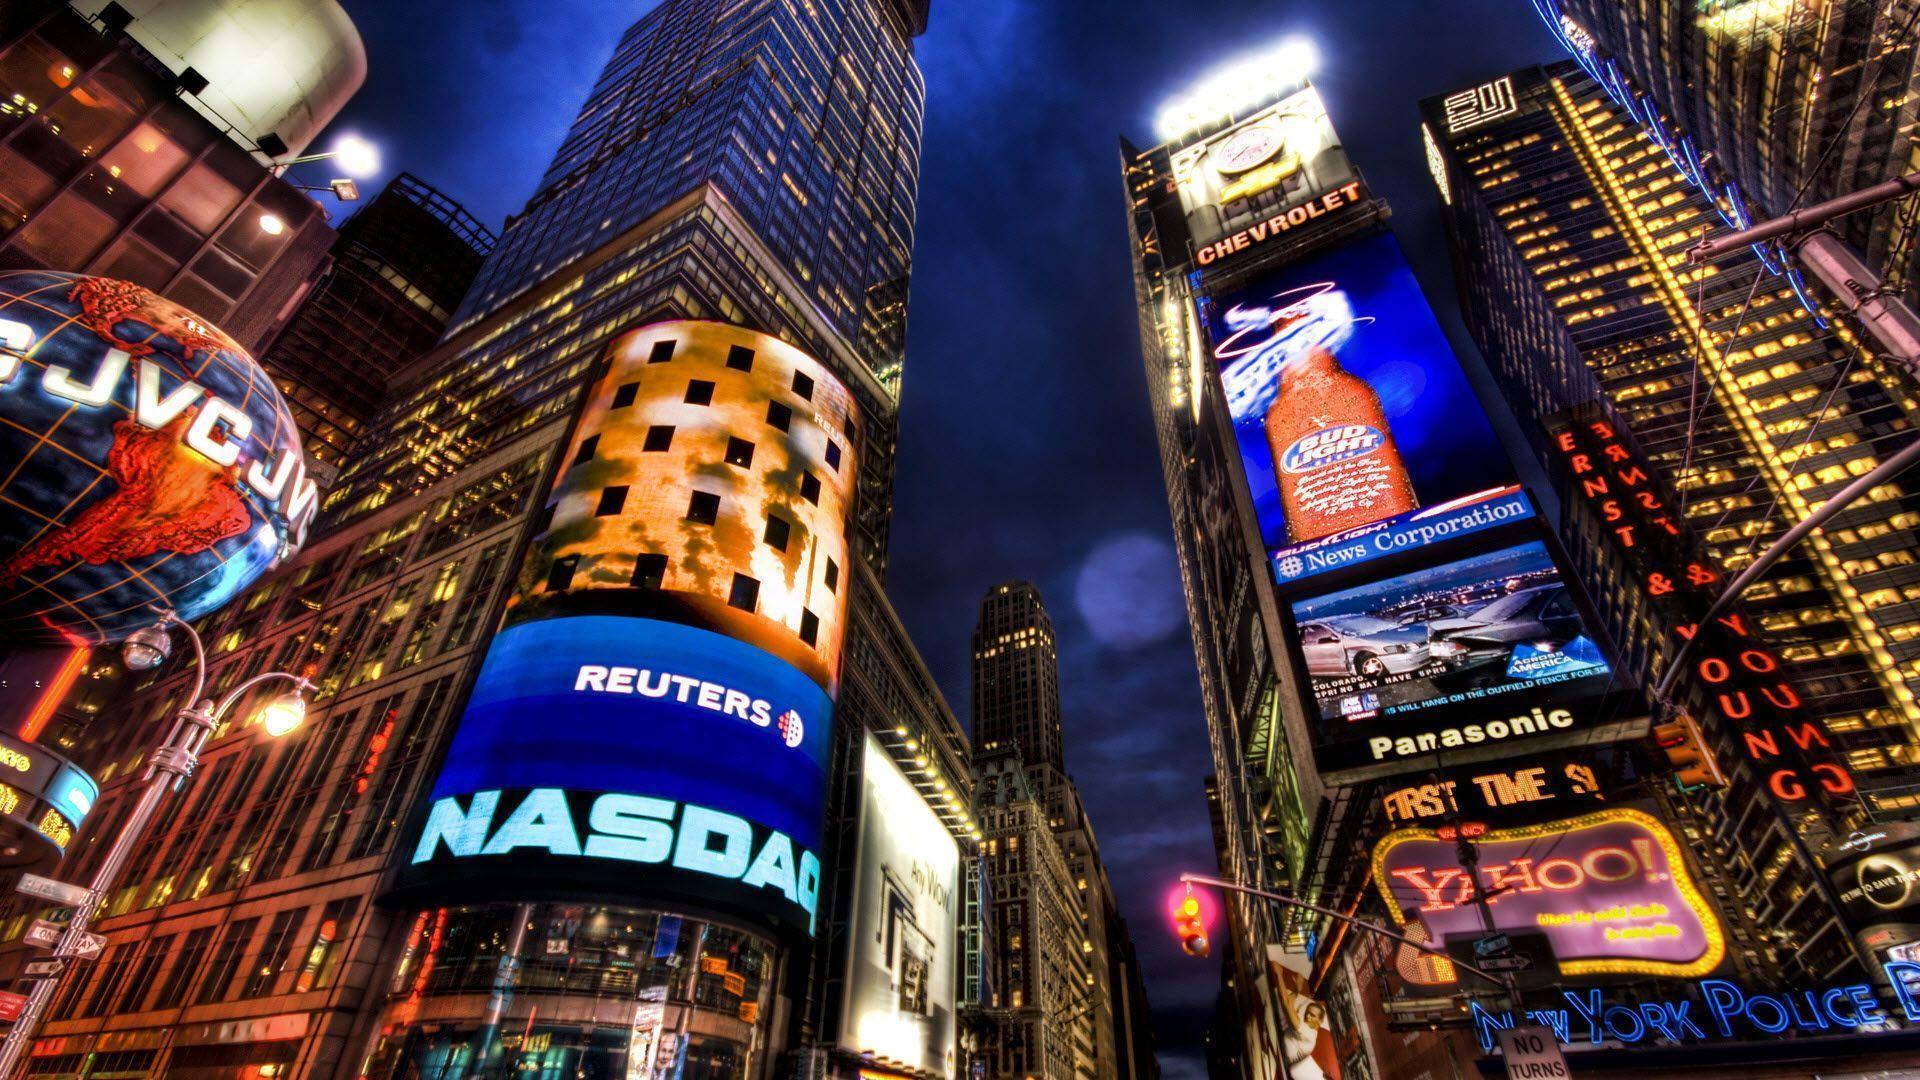 NASDAQ Stock Market New York Wallpapers   HD Wallpapers